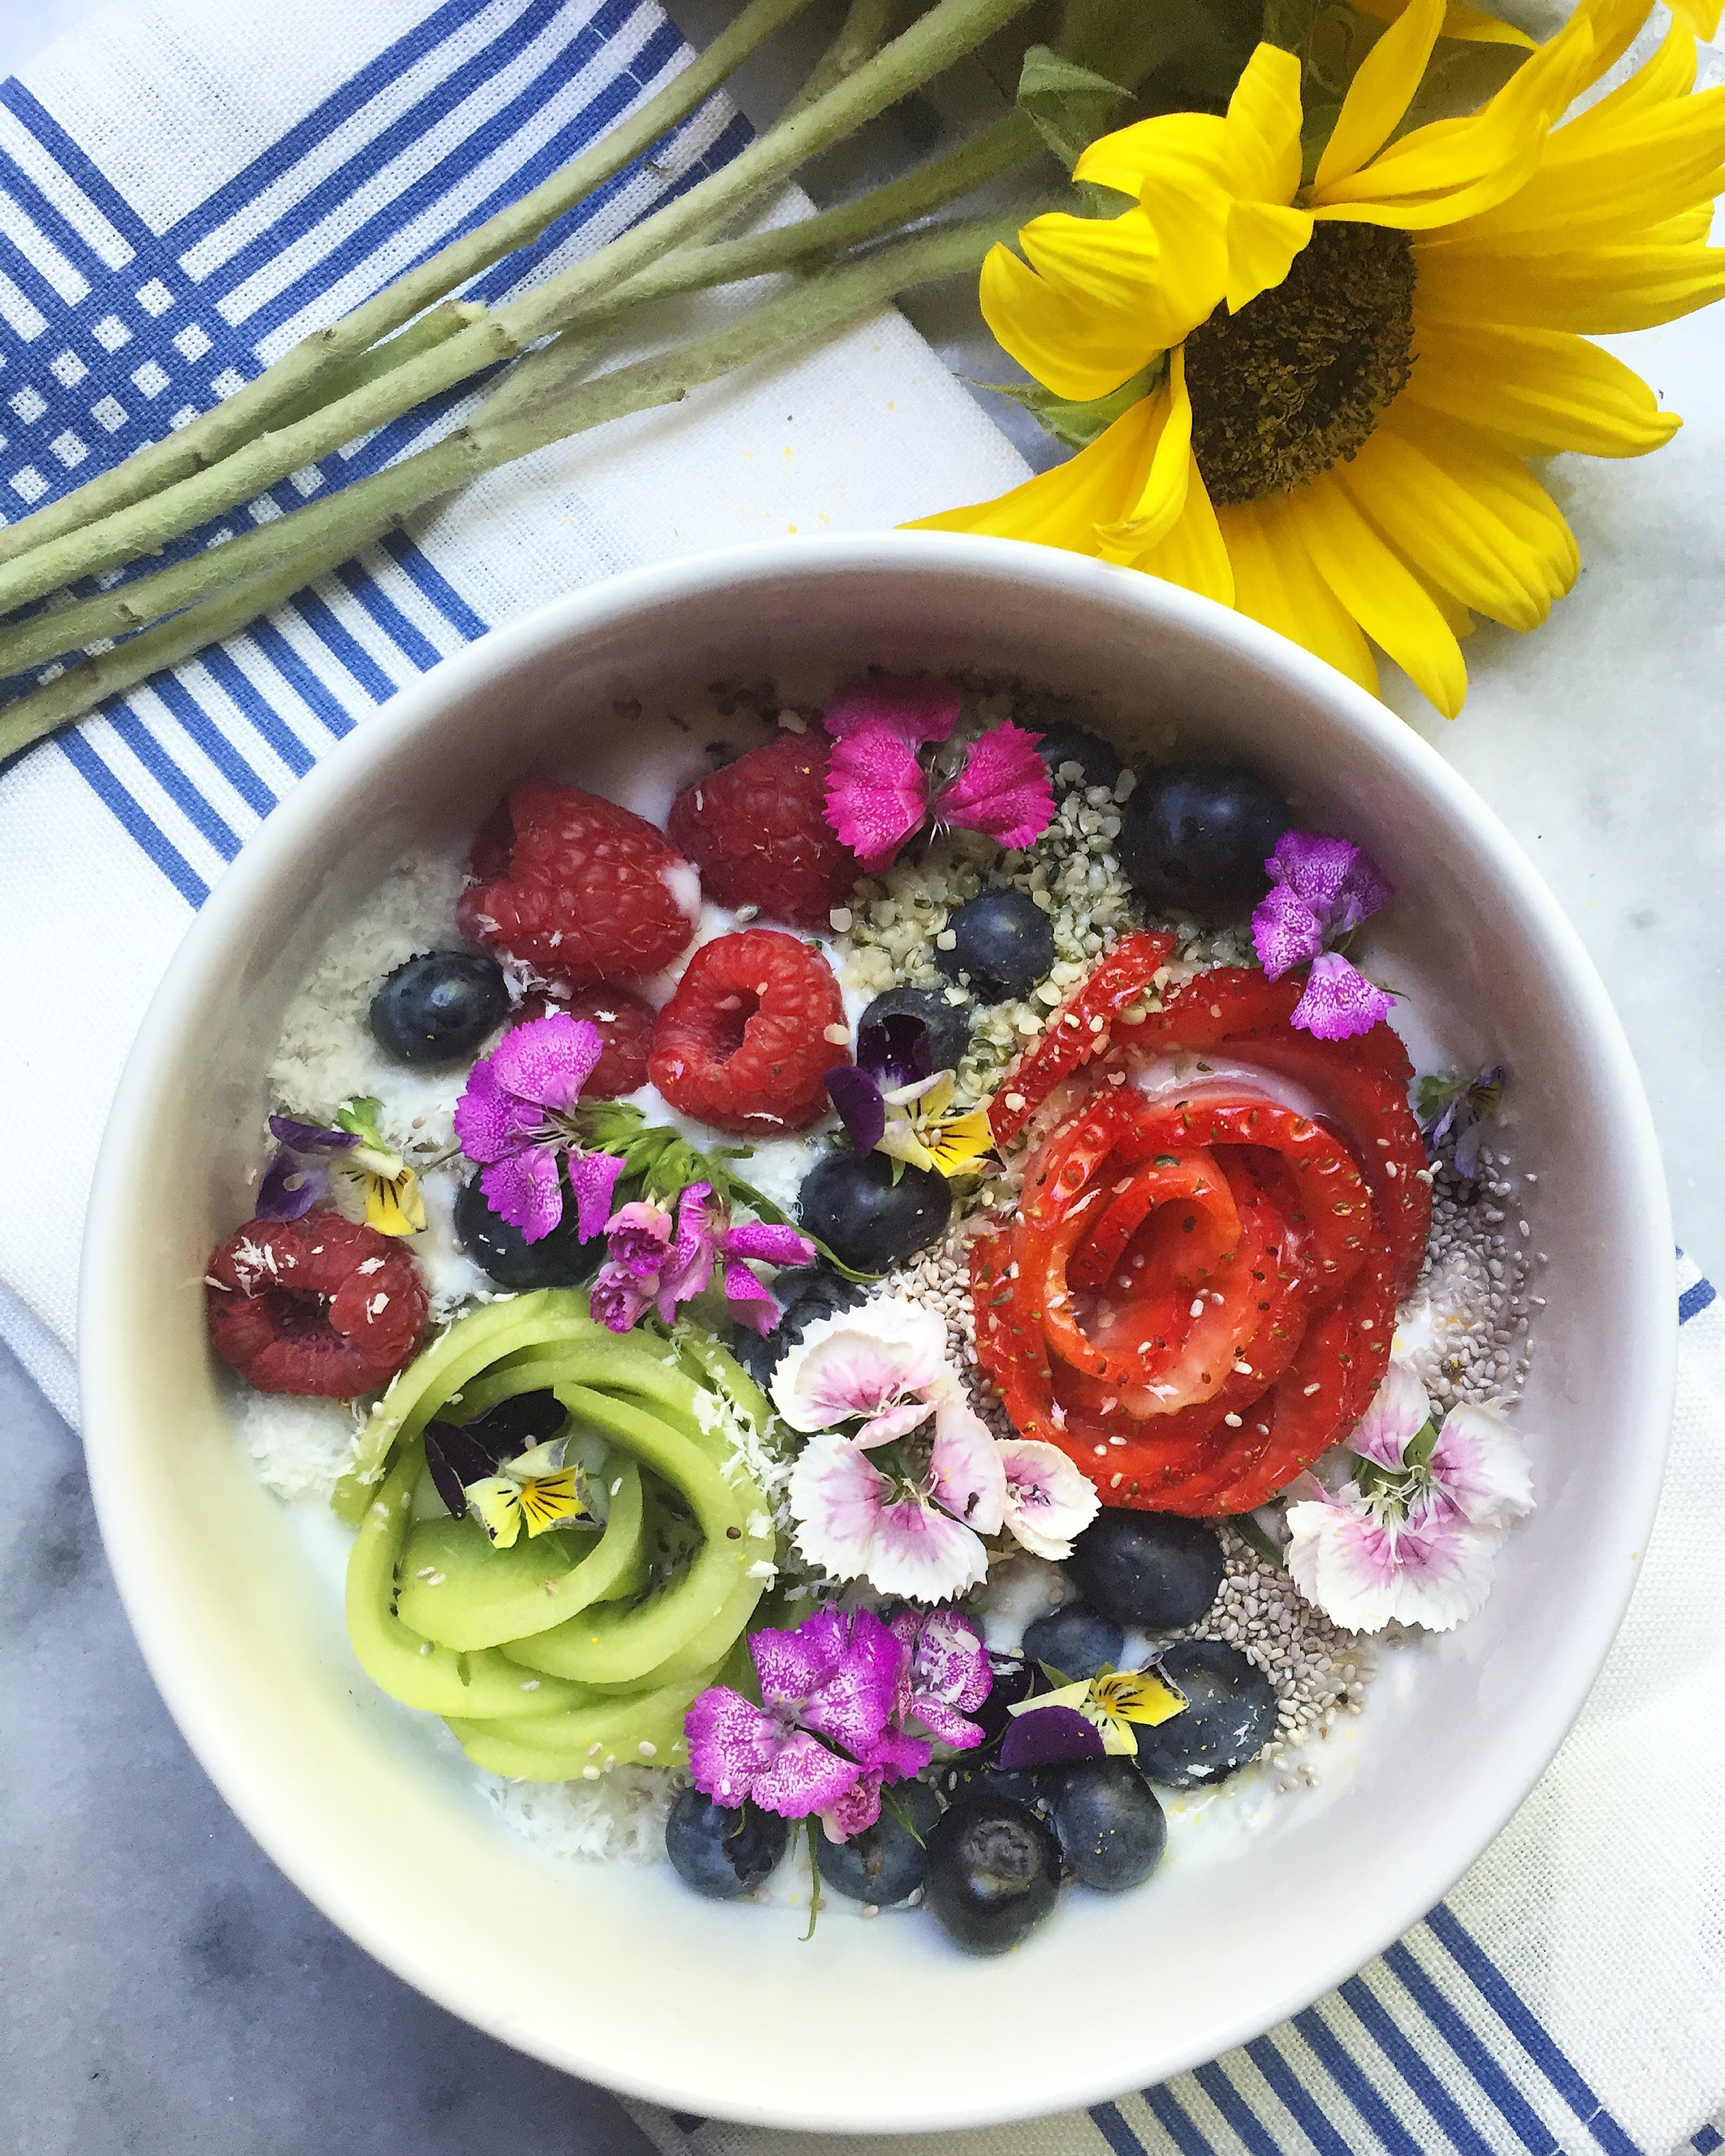 Kidney Nourishing Smoothie -